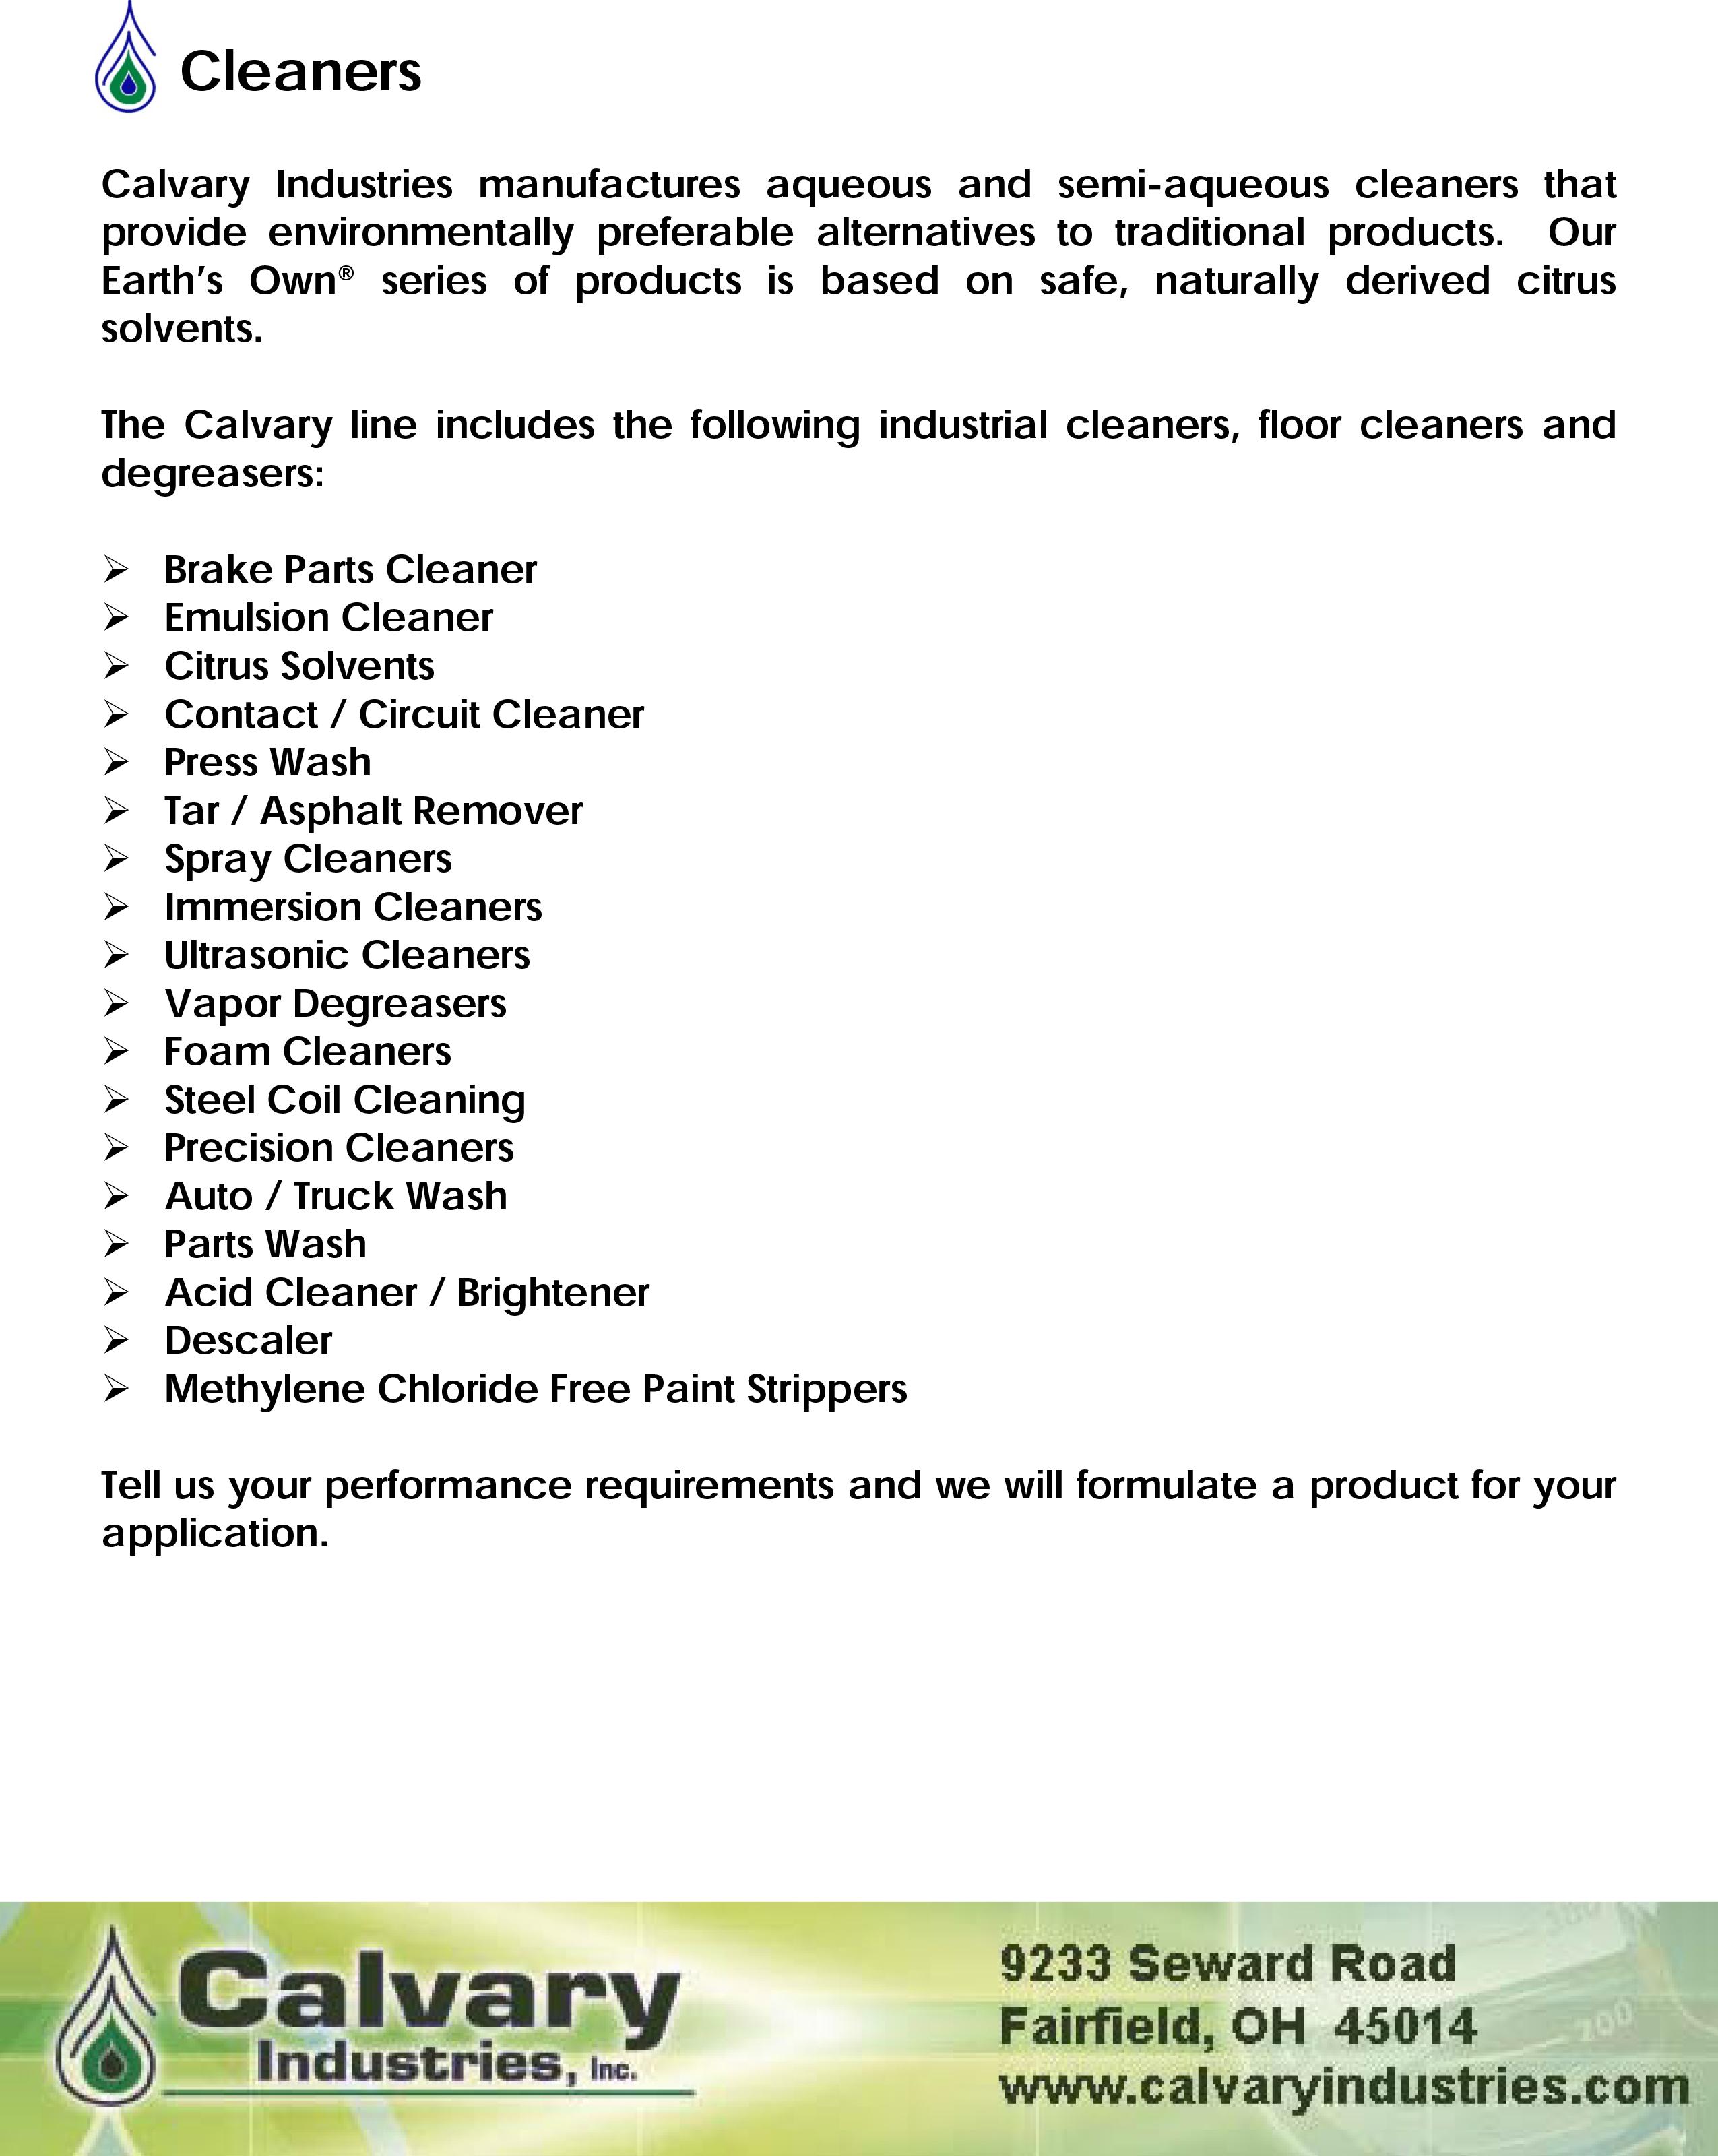 Cleaners-brochure